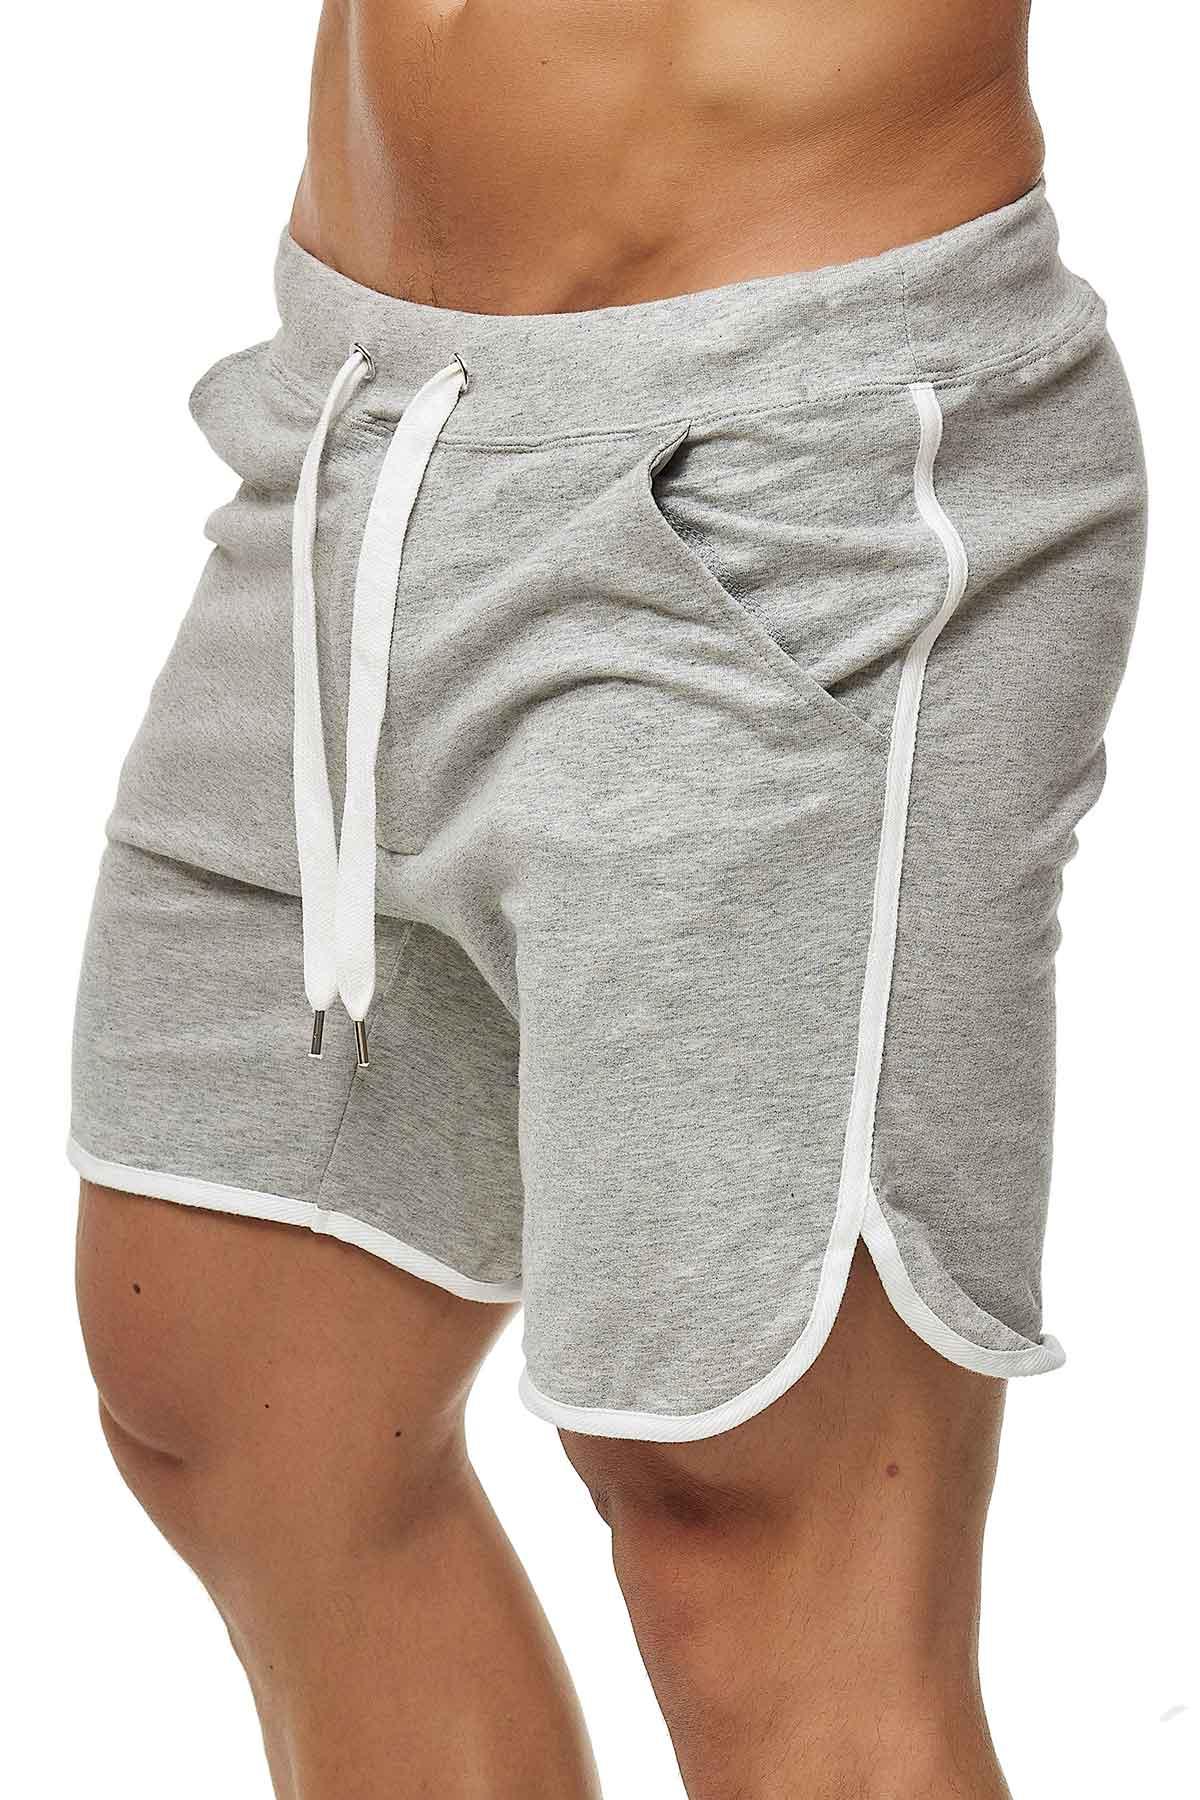 Herren Shorts aus Baumwolle Combat – Bild 11 13bd37e202